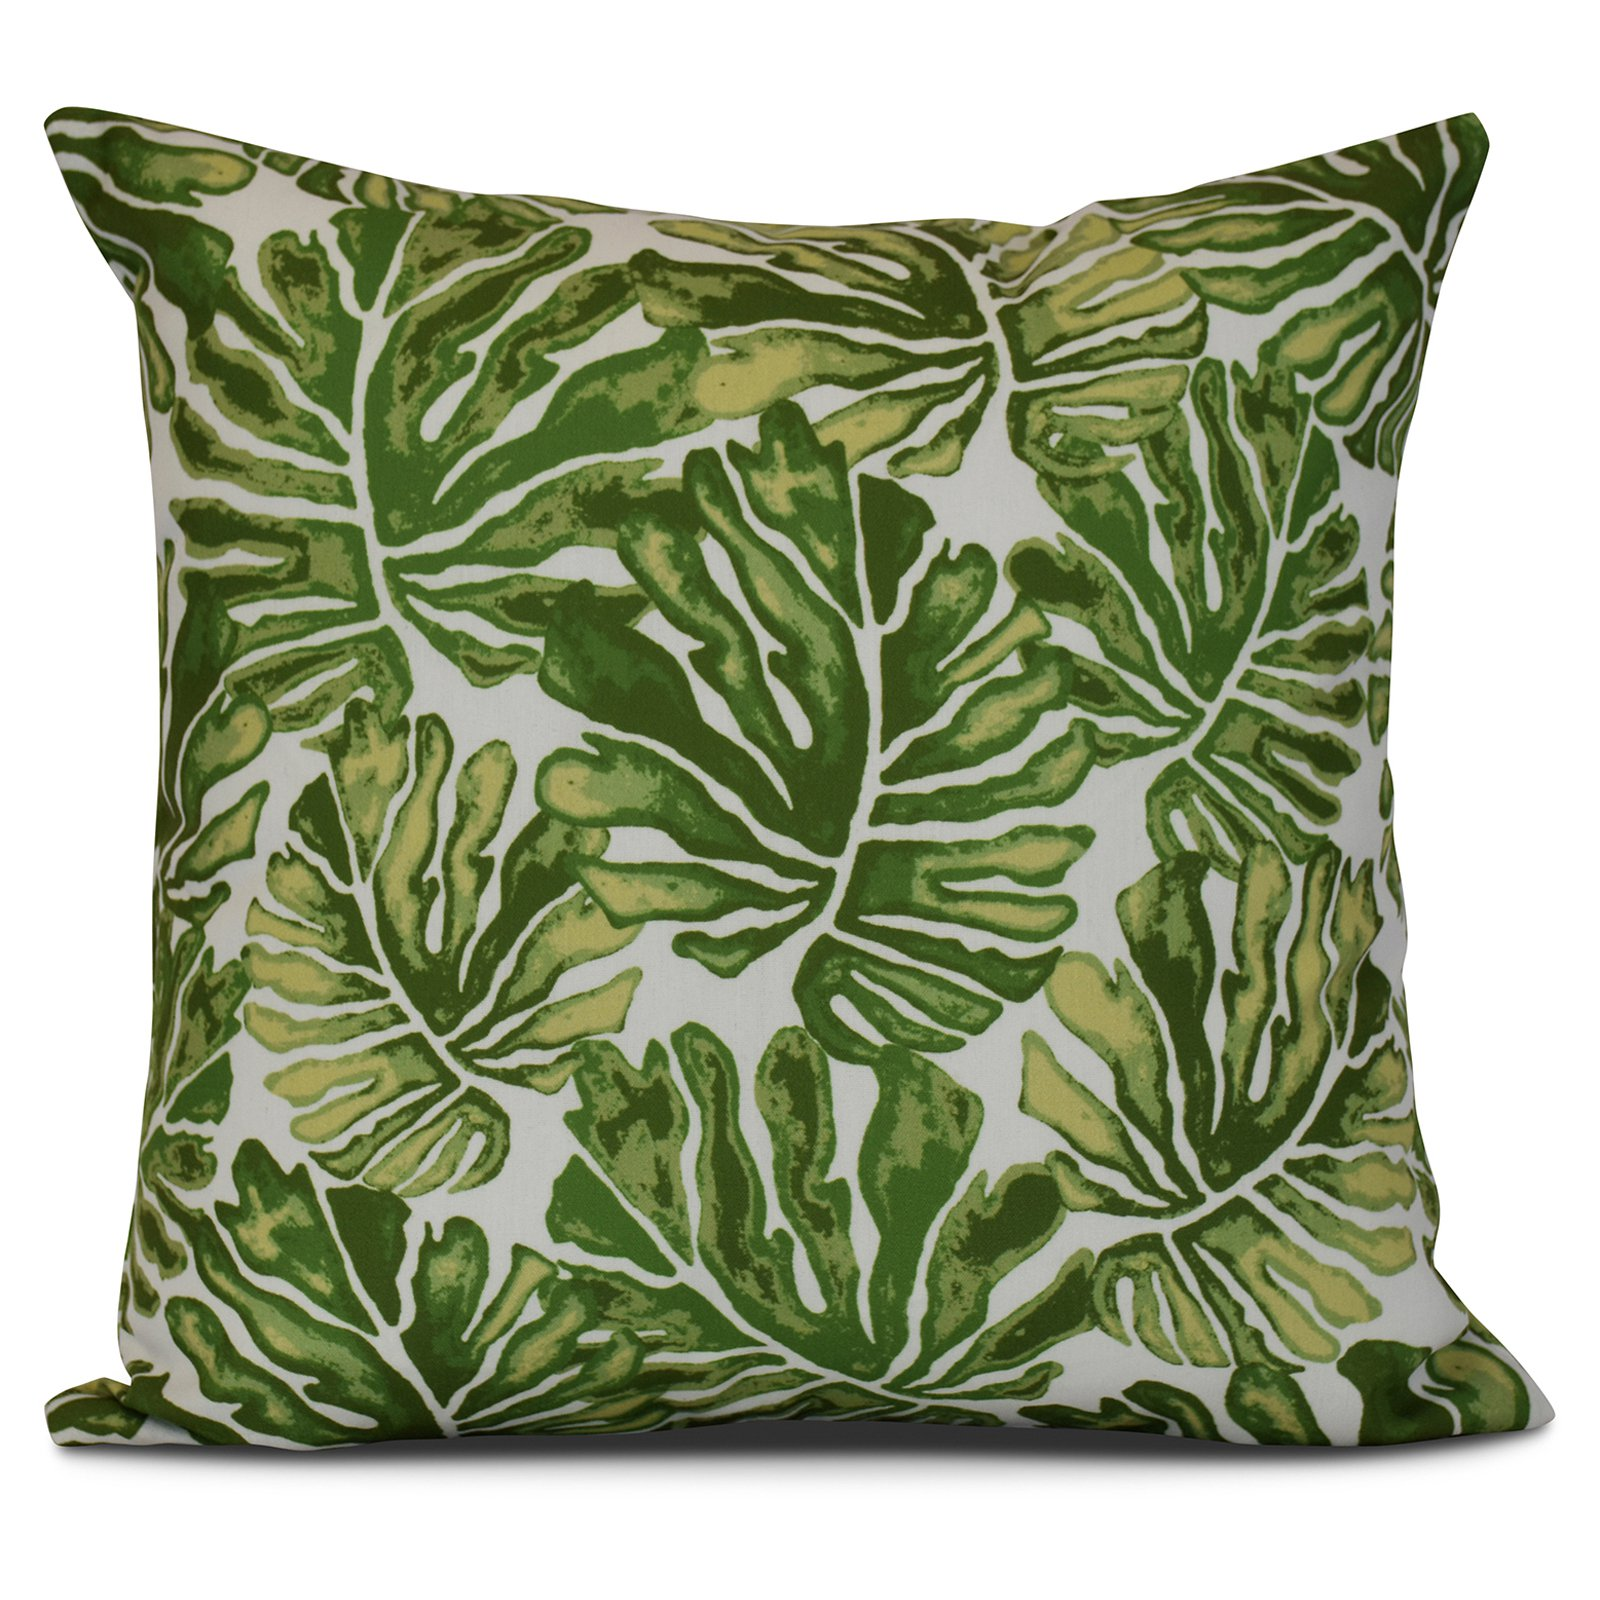 LiLiPi Evoke Decorative Accent Throw Pillow